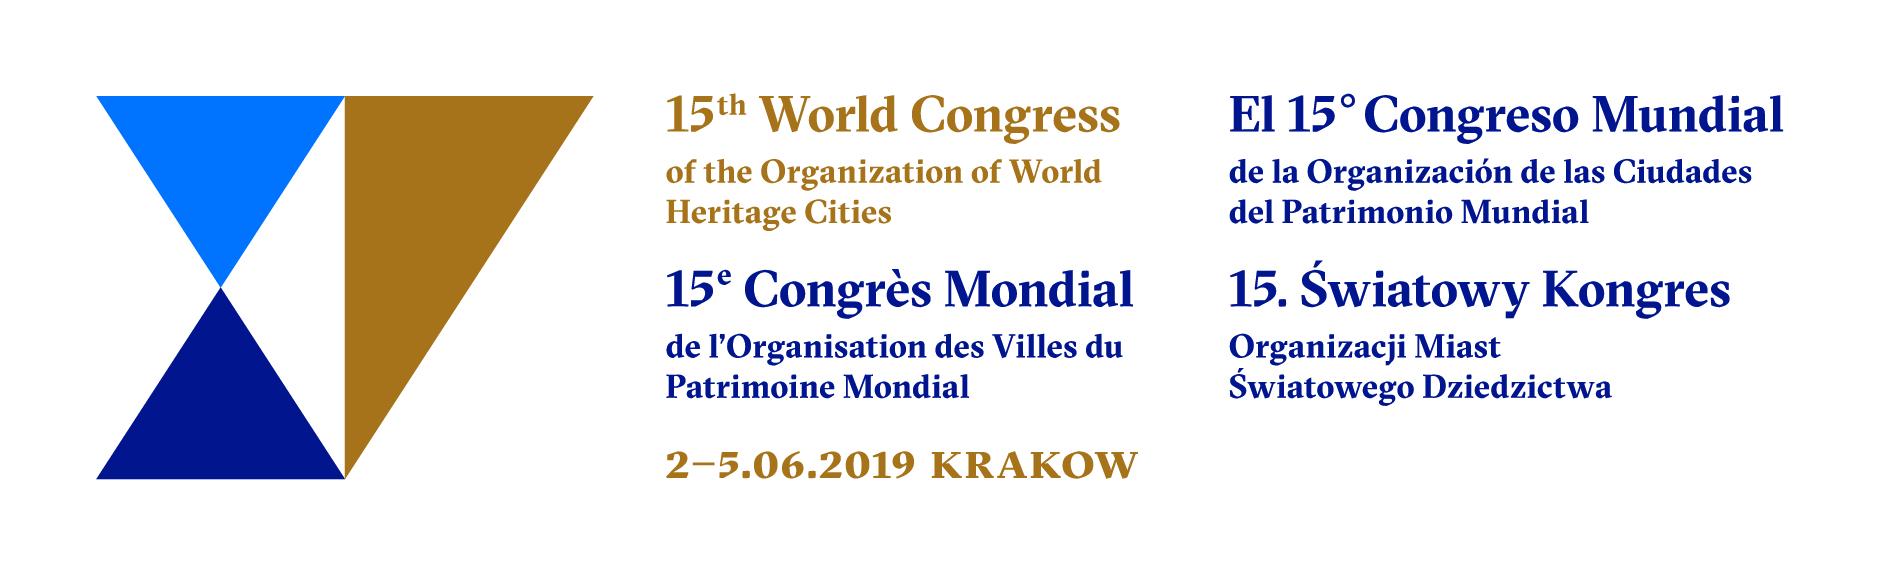 2019 - Krakow, Poland - Organization of World Heritage Cities